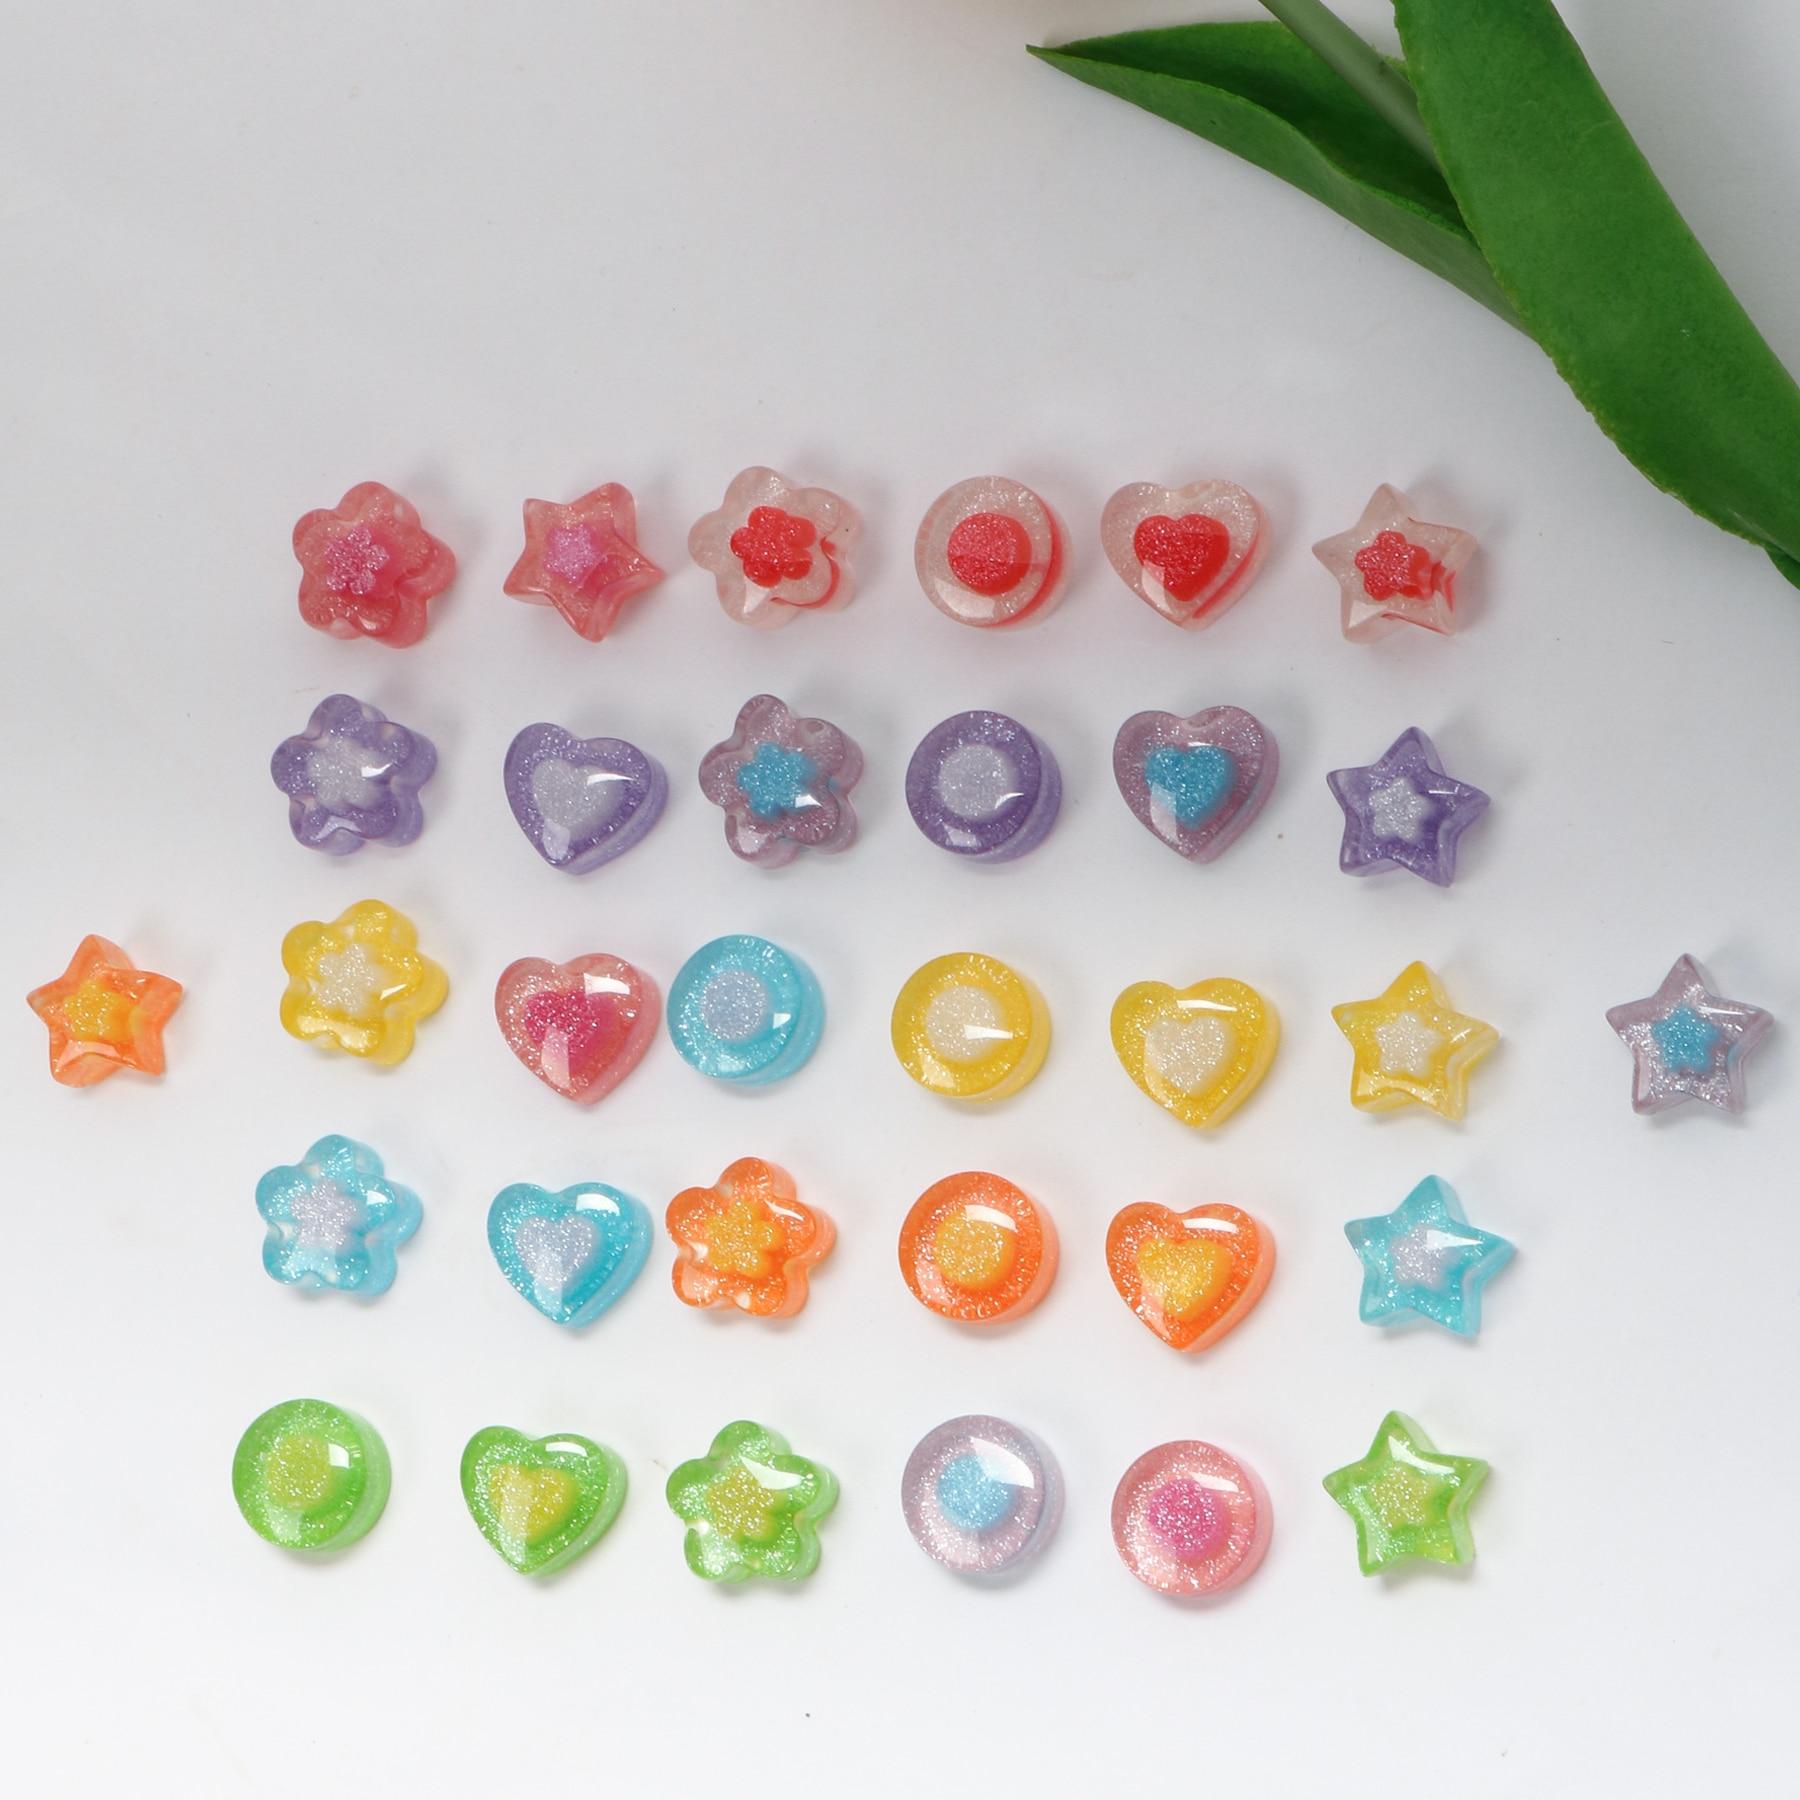 Pequena flor amor menina glitter resina cor de patch acessórios materiais DIY handmade hairpin jóias brincos do prego